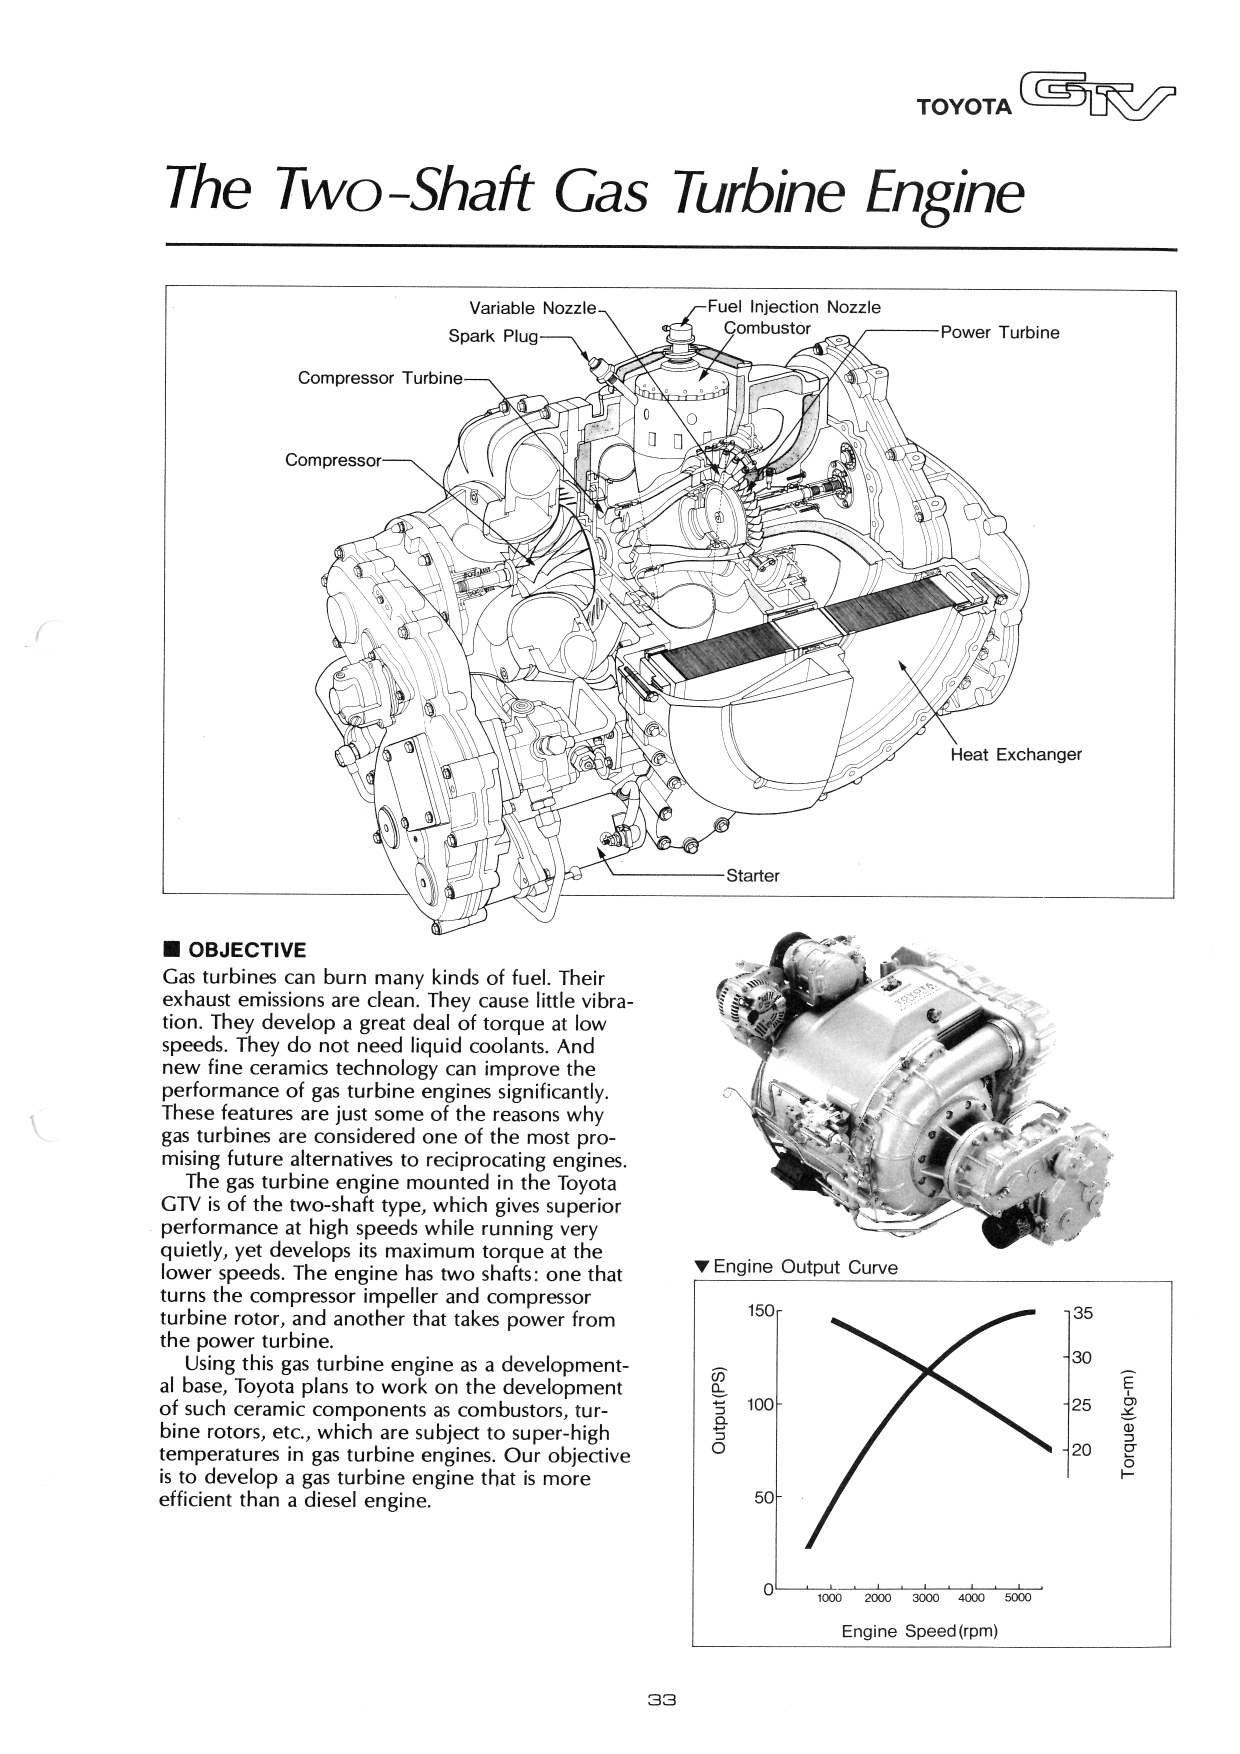 1987 Toyota GTV Concepts